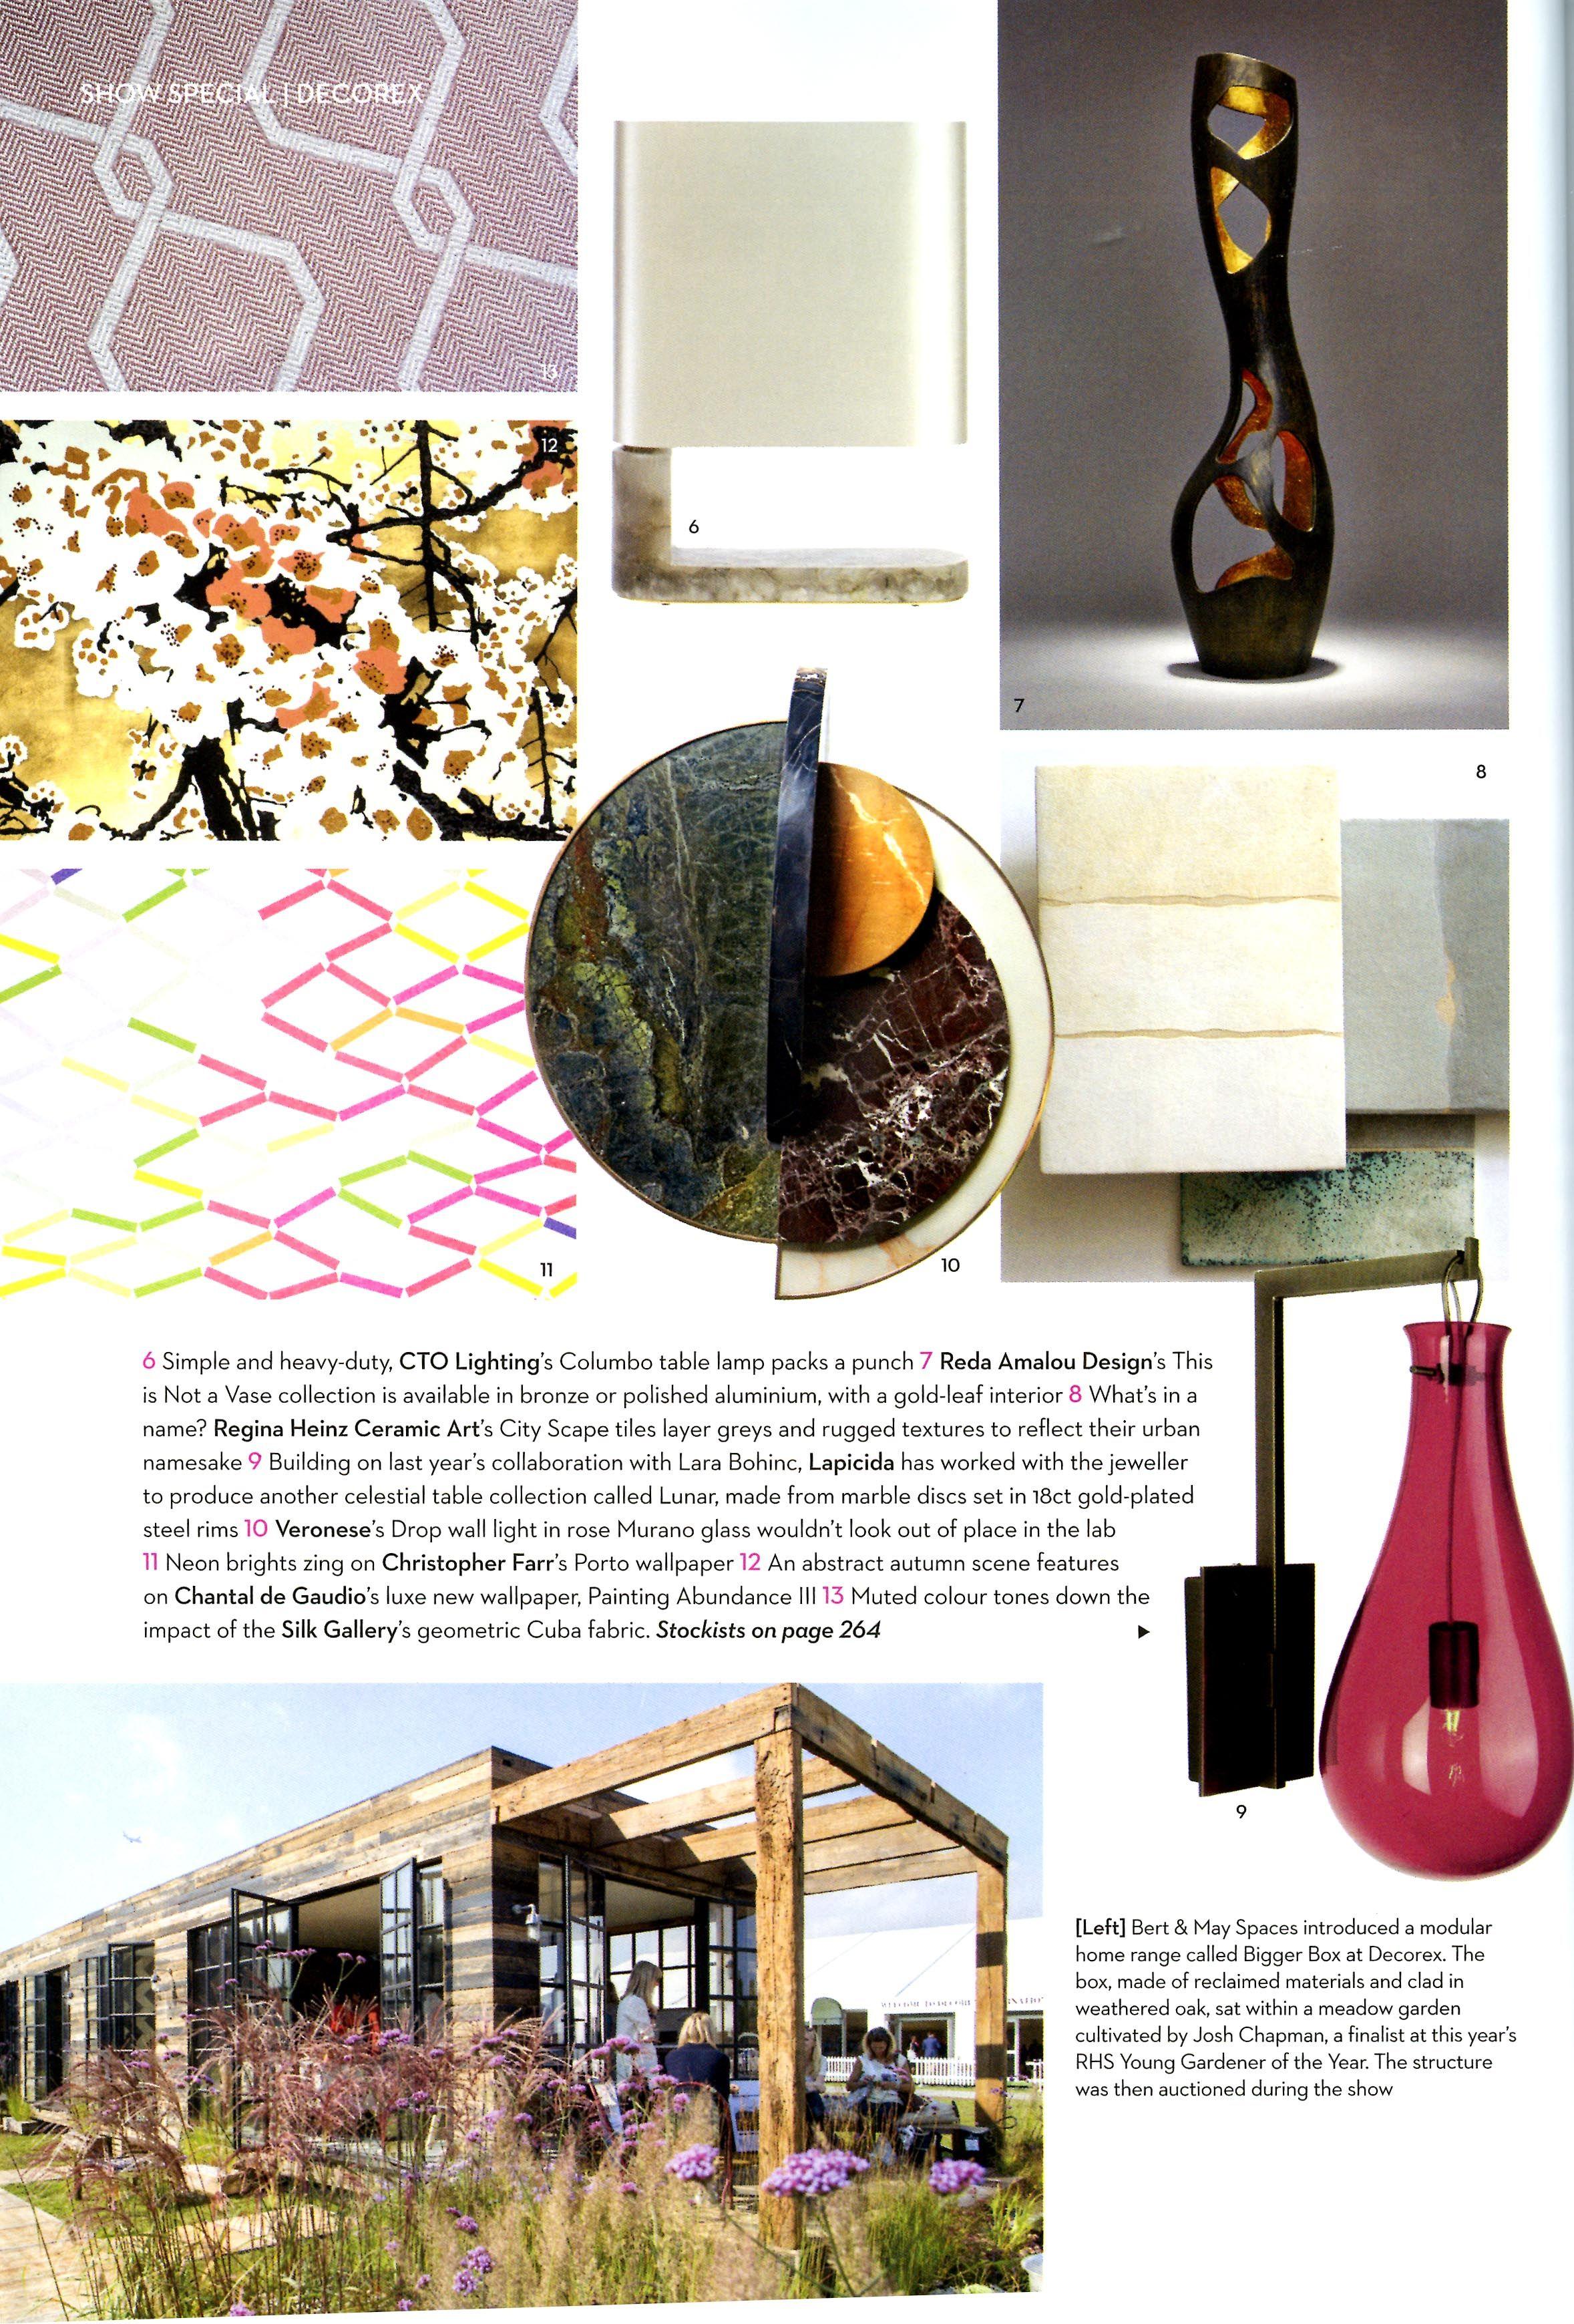 Full moon side table designed by lara bohinc for lapicida homes  interiors also rh za pinterest